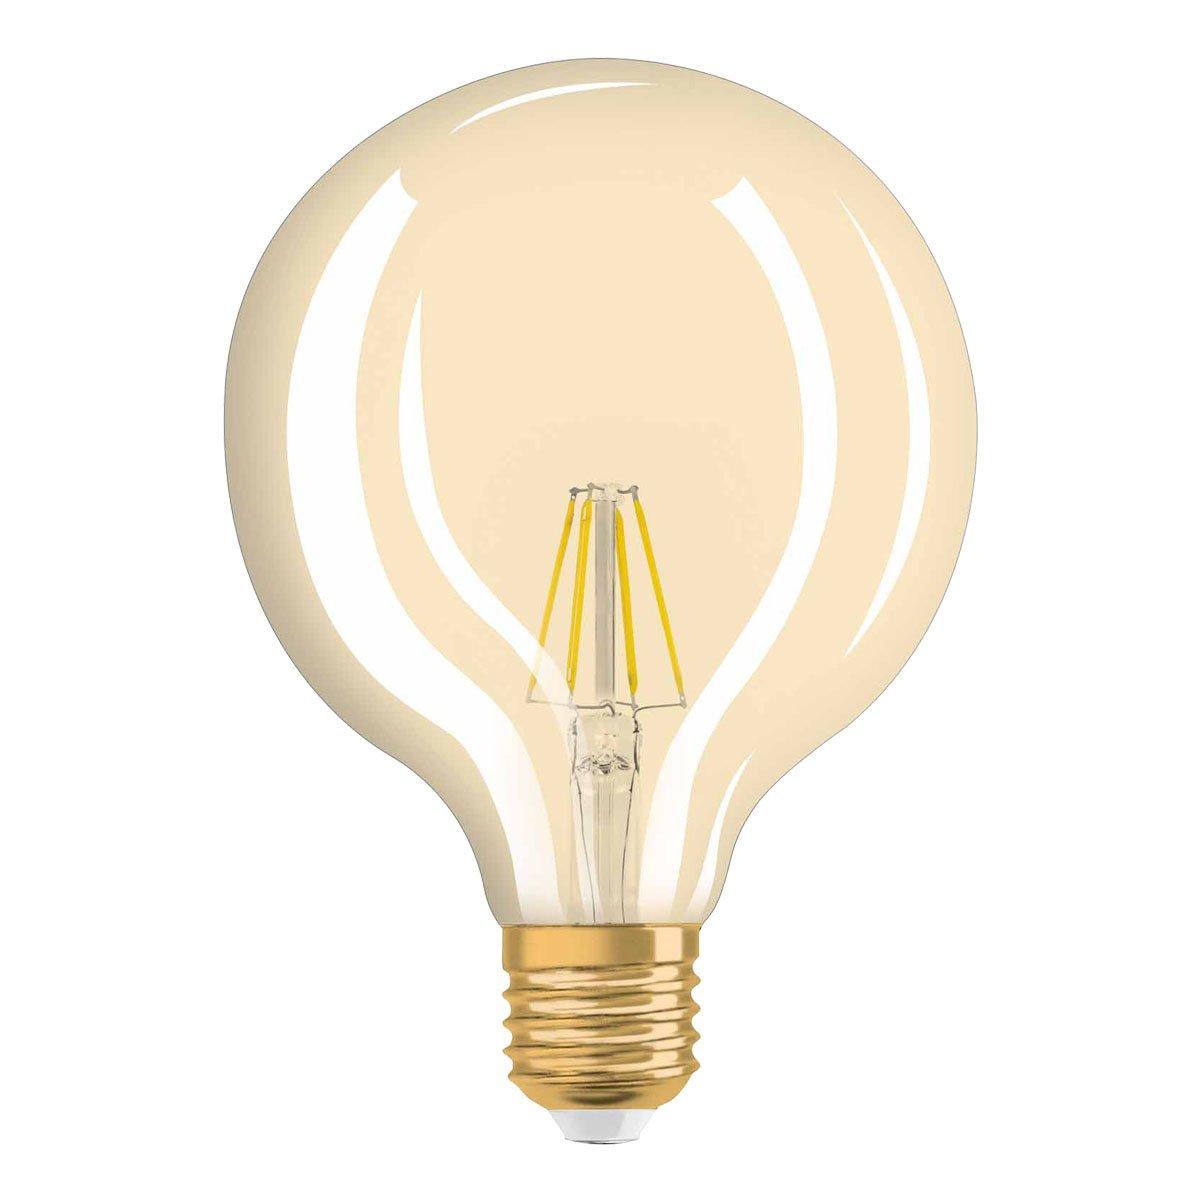 Osram LED Vintage Edition 1906, LED Lampe in Ballform mit E27 ...